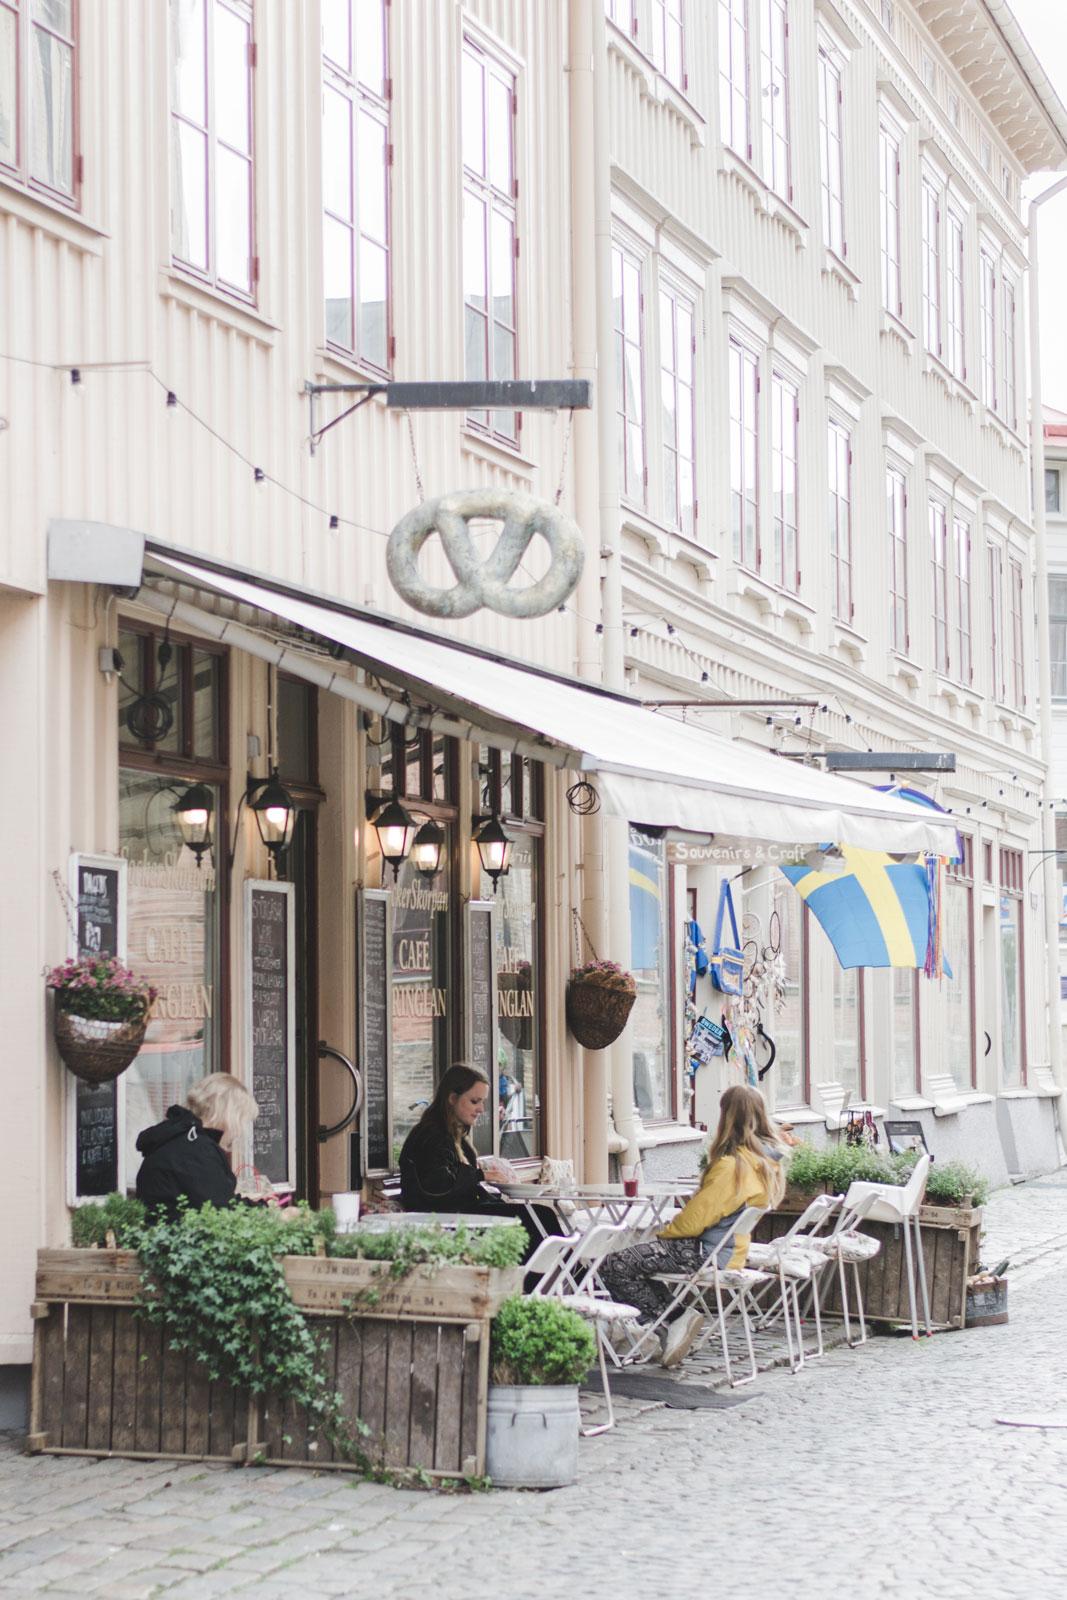 haga-nygata-gothenburg